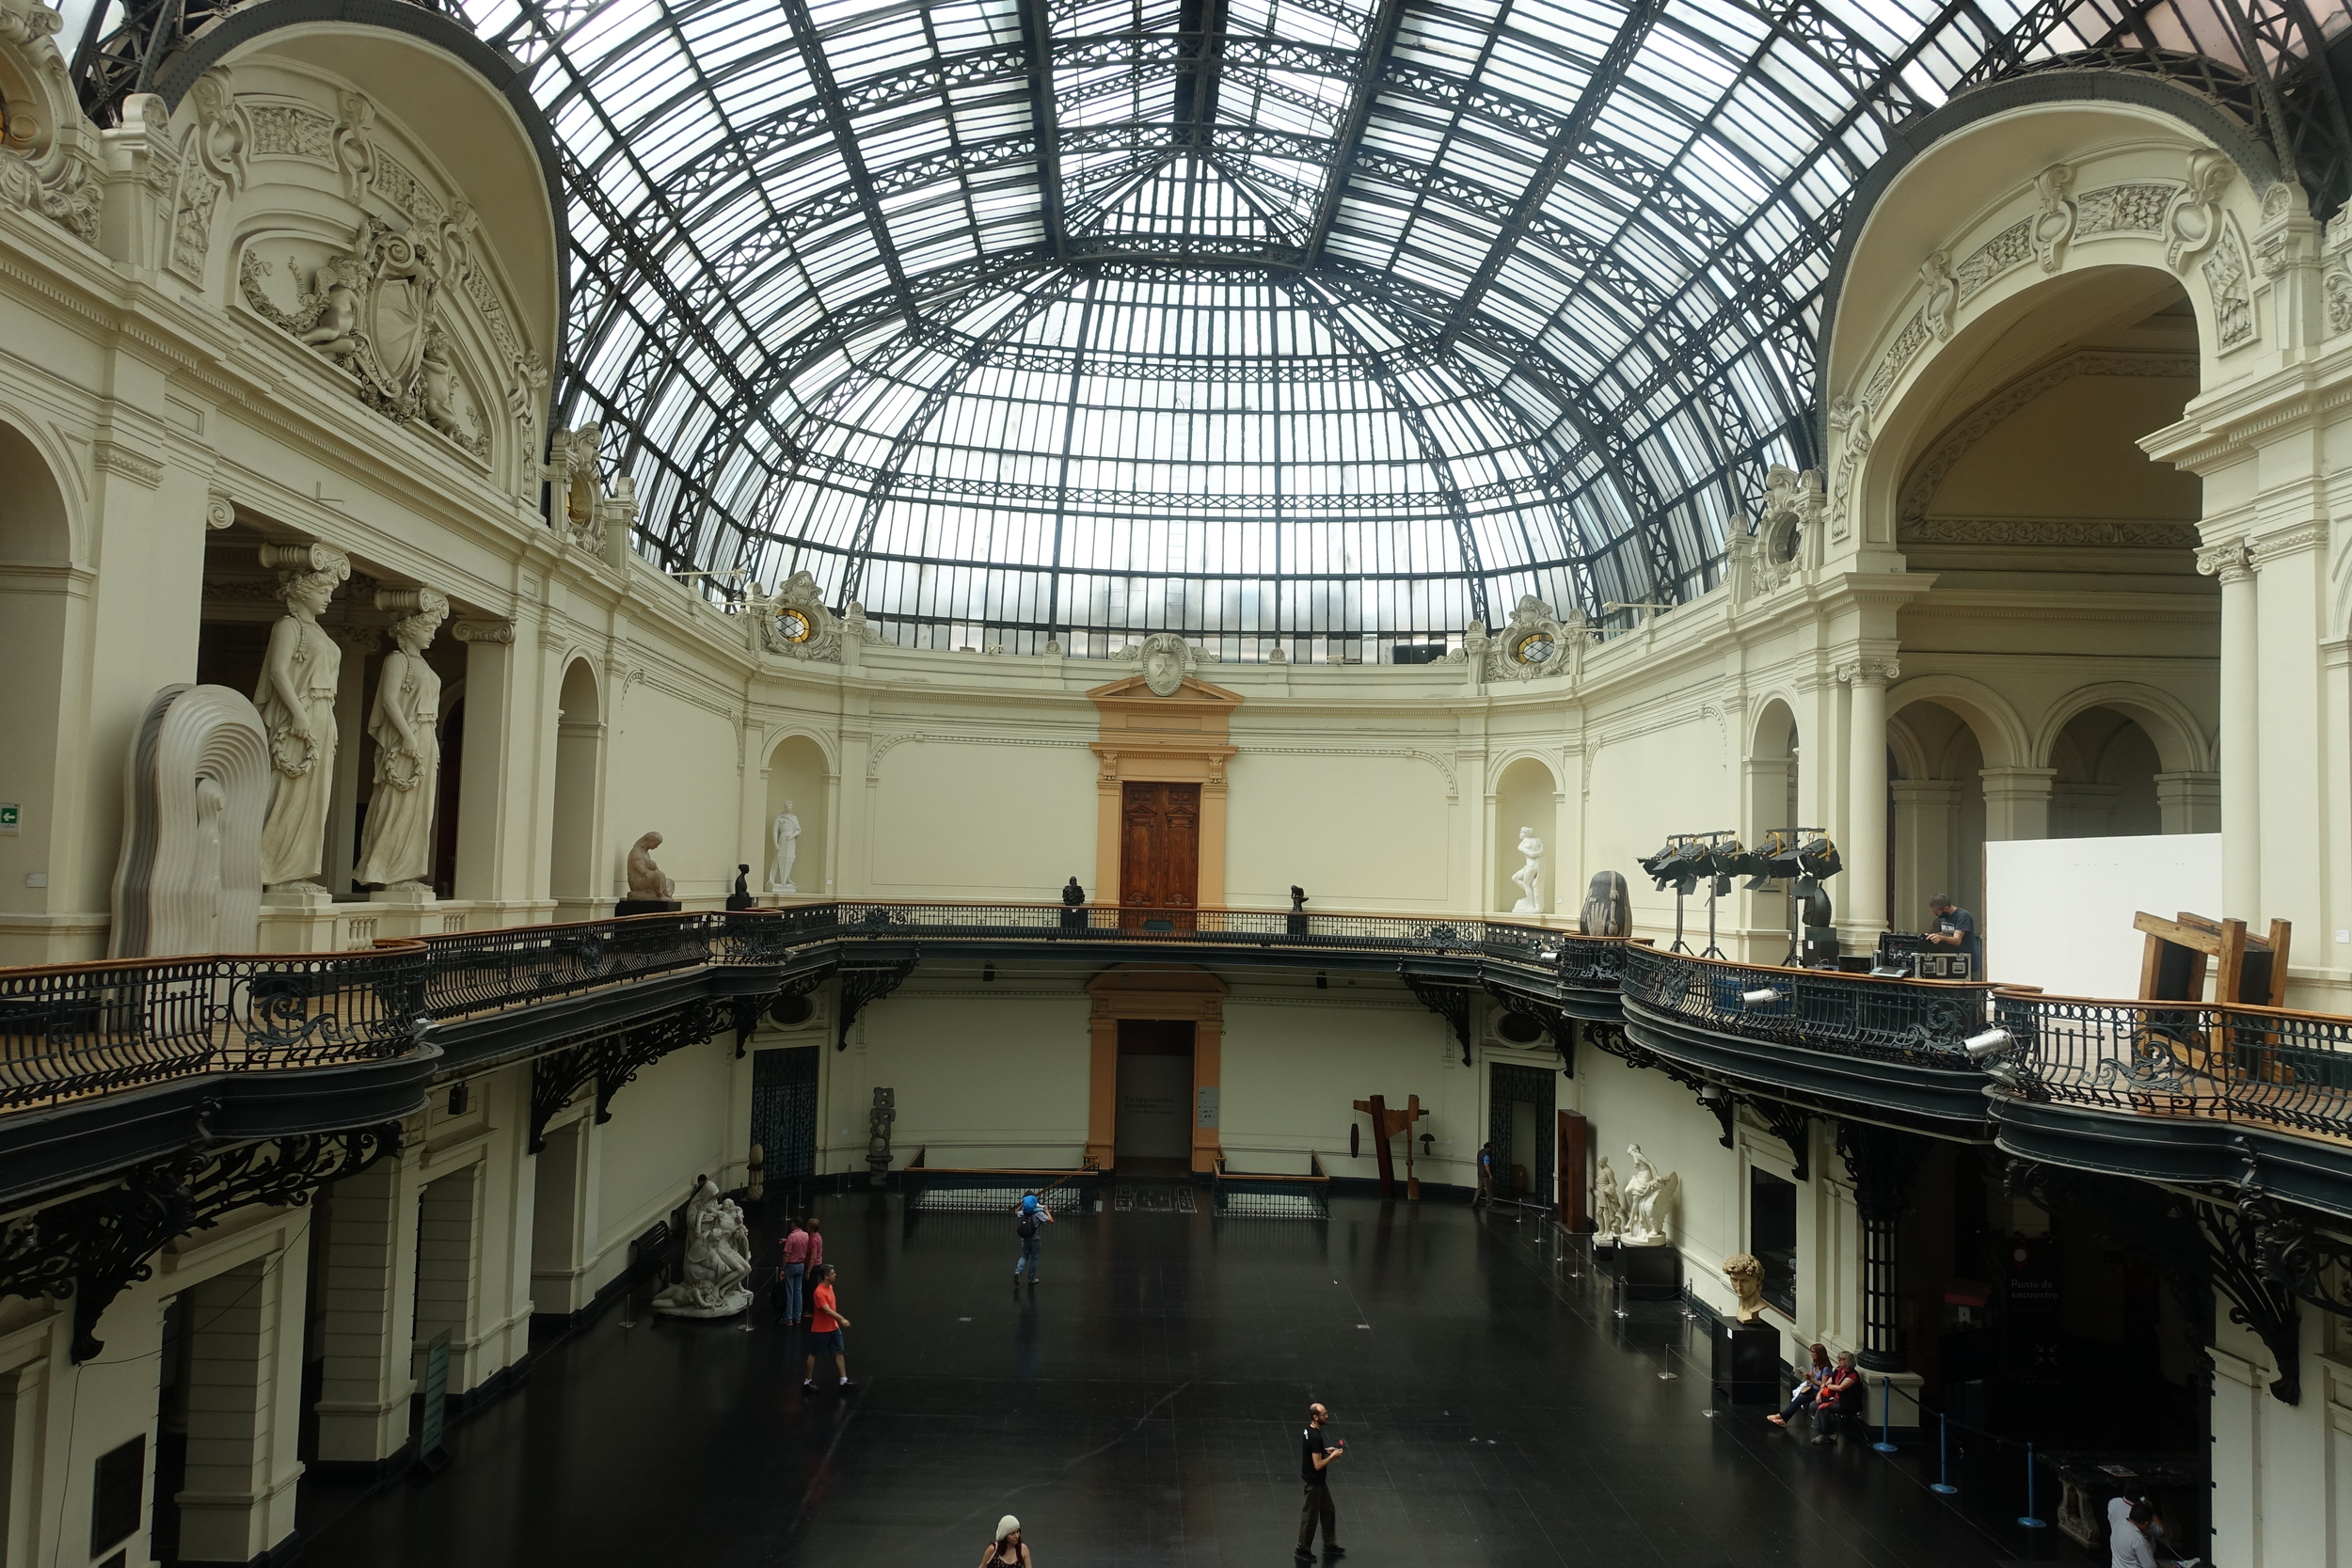 Inside Museo de Belles Artes